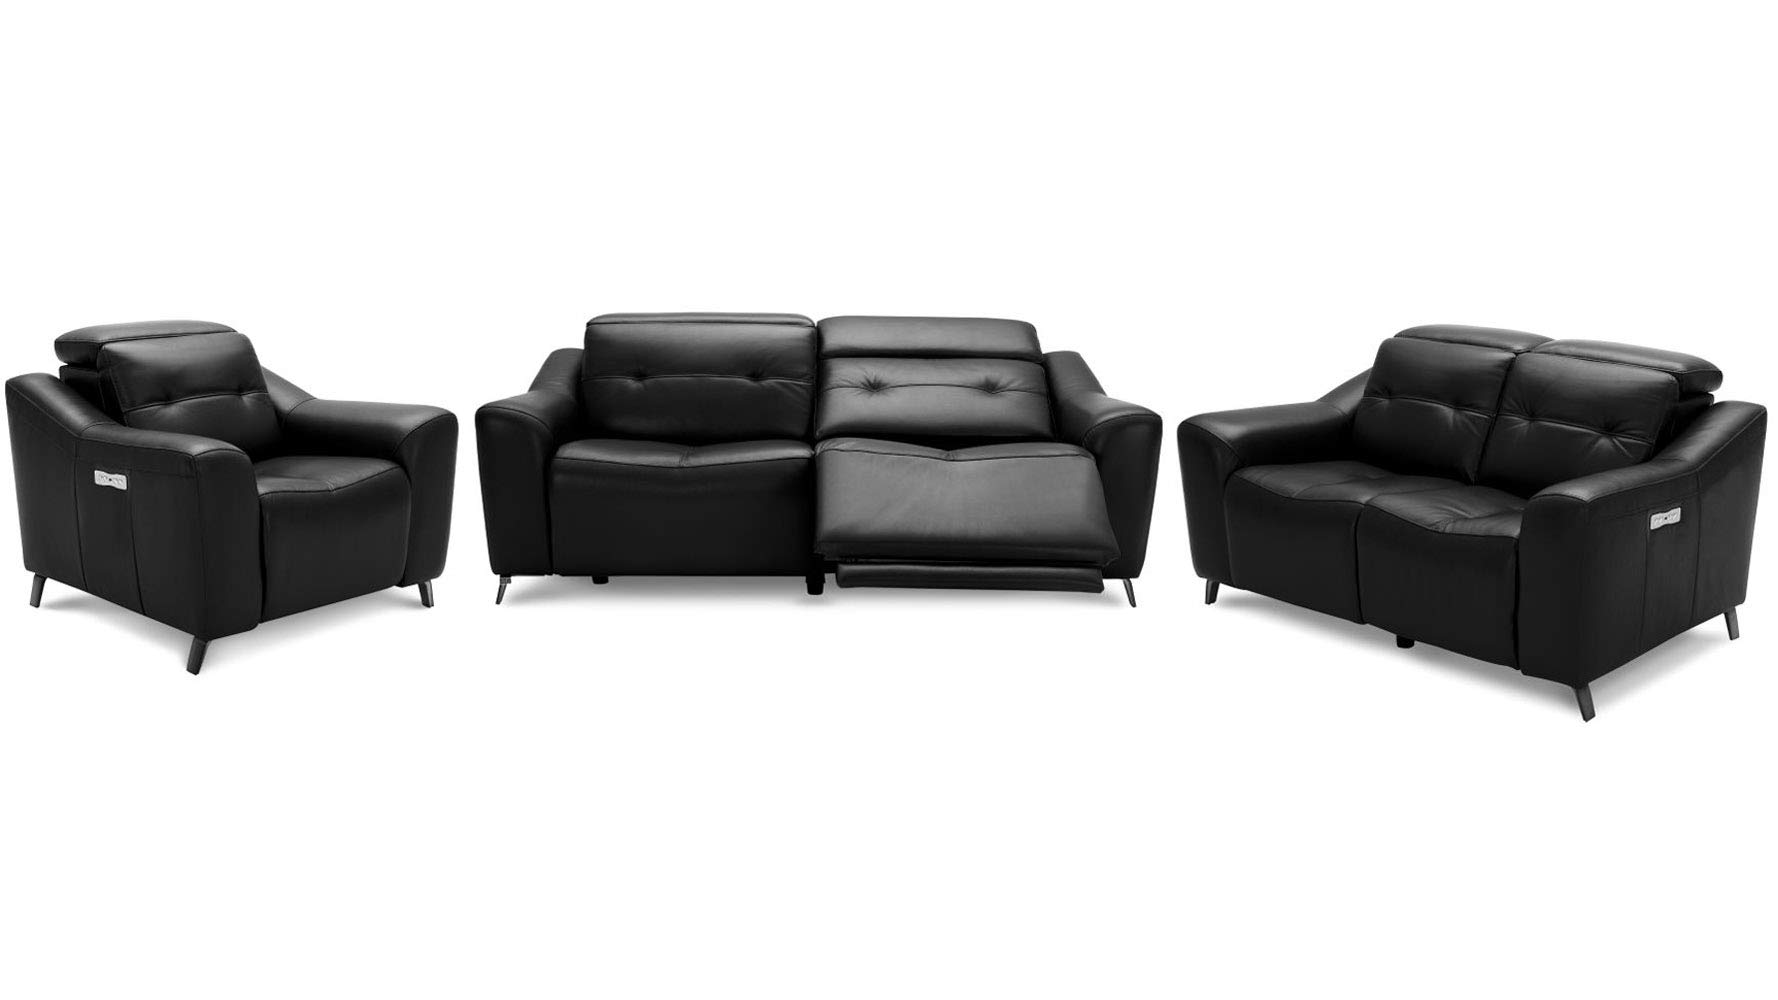 Zuri Furniture Modern Linq Power Reclining Black Leather Sofa Set